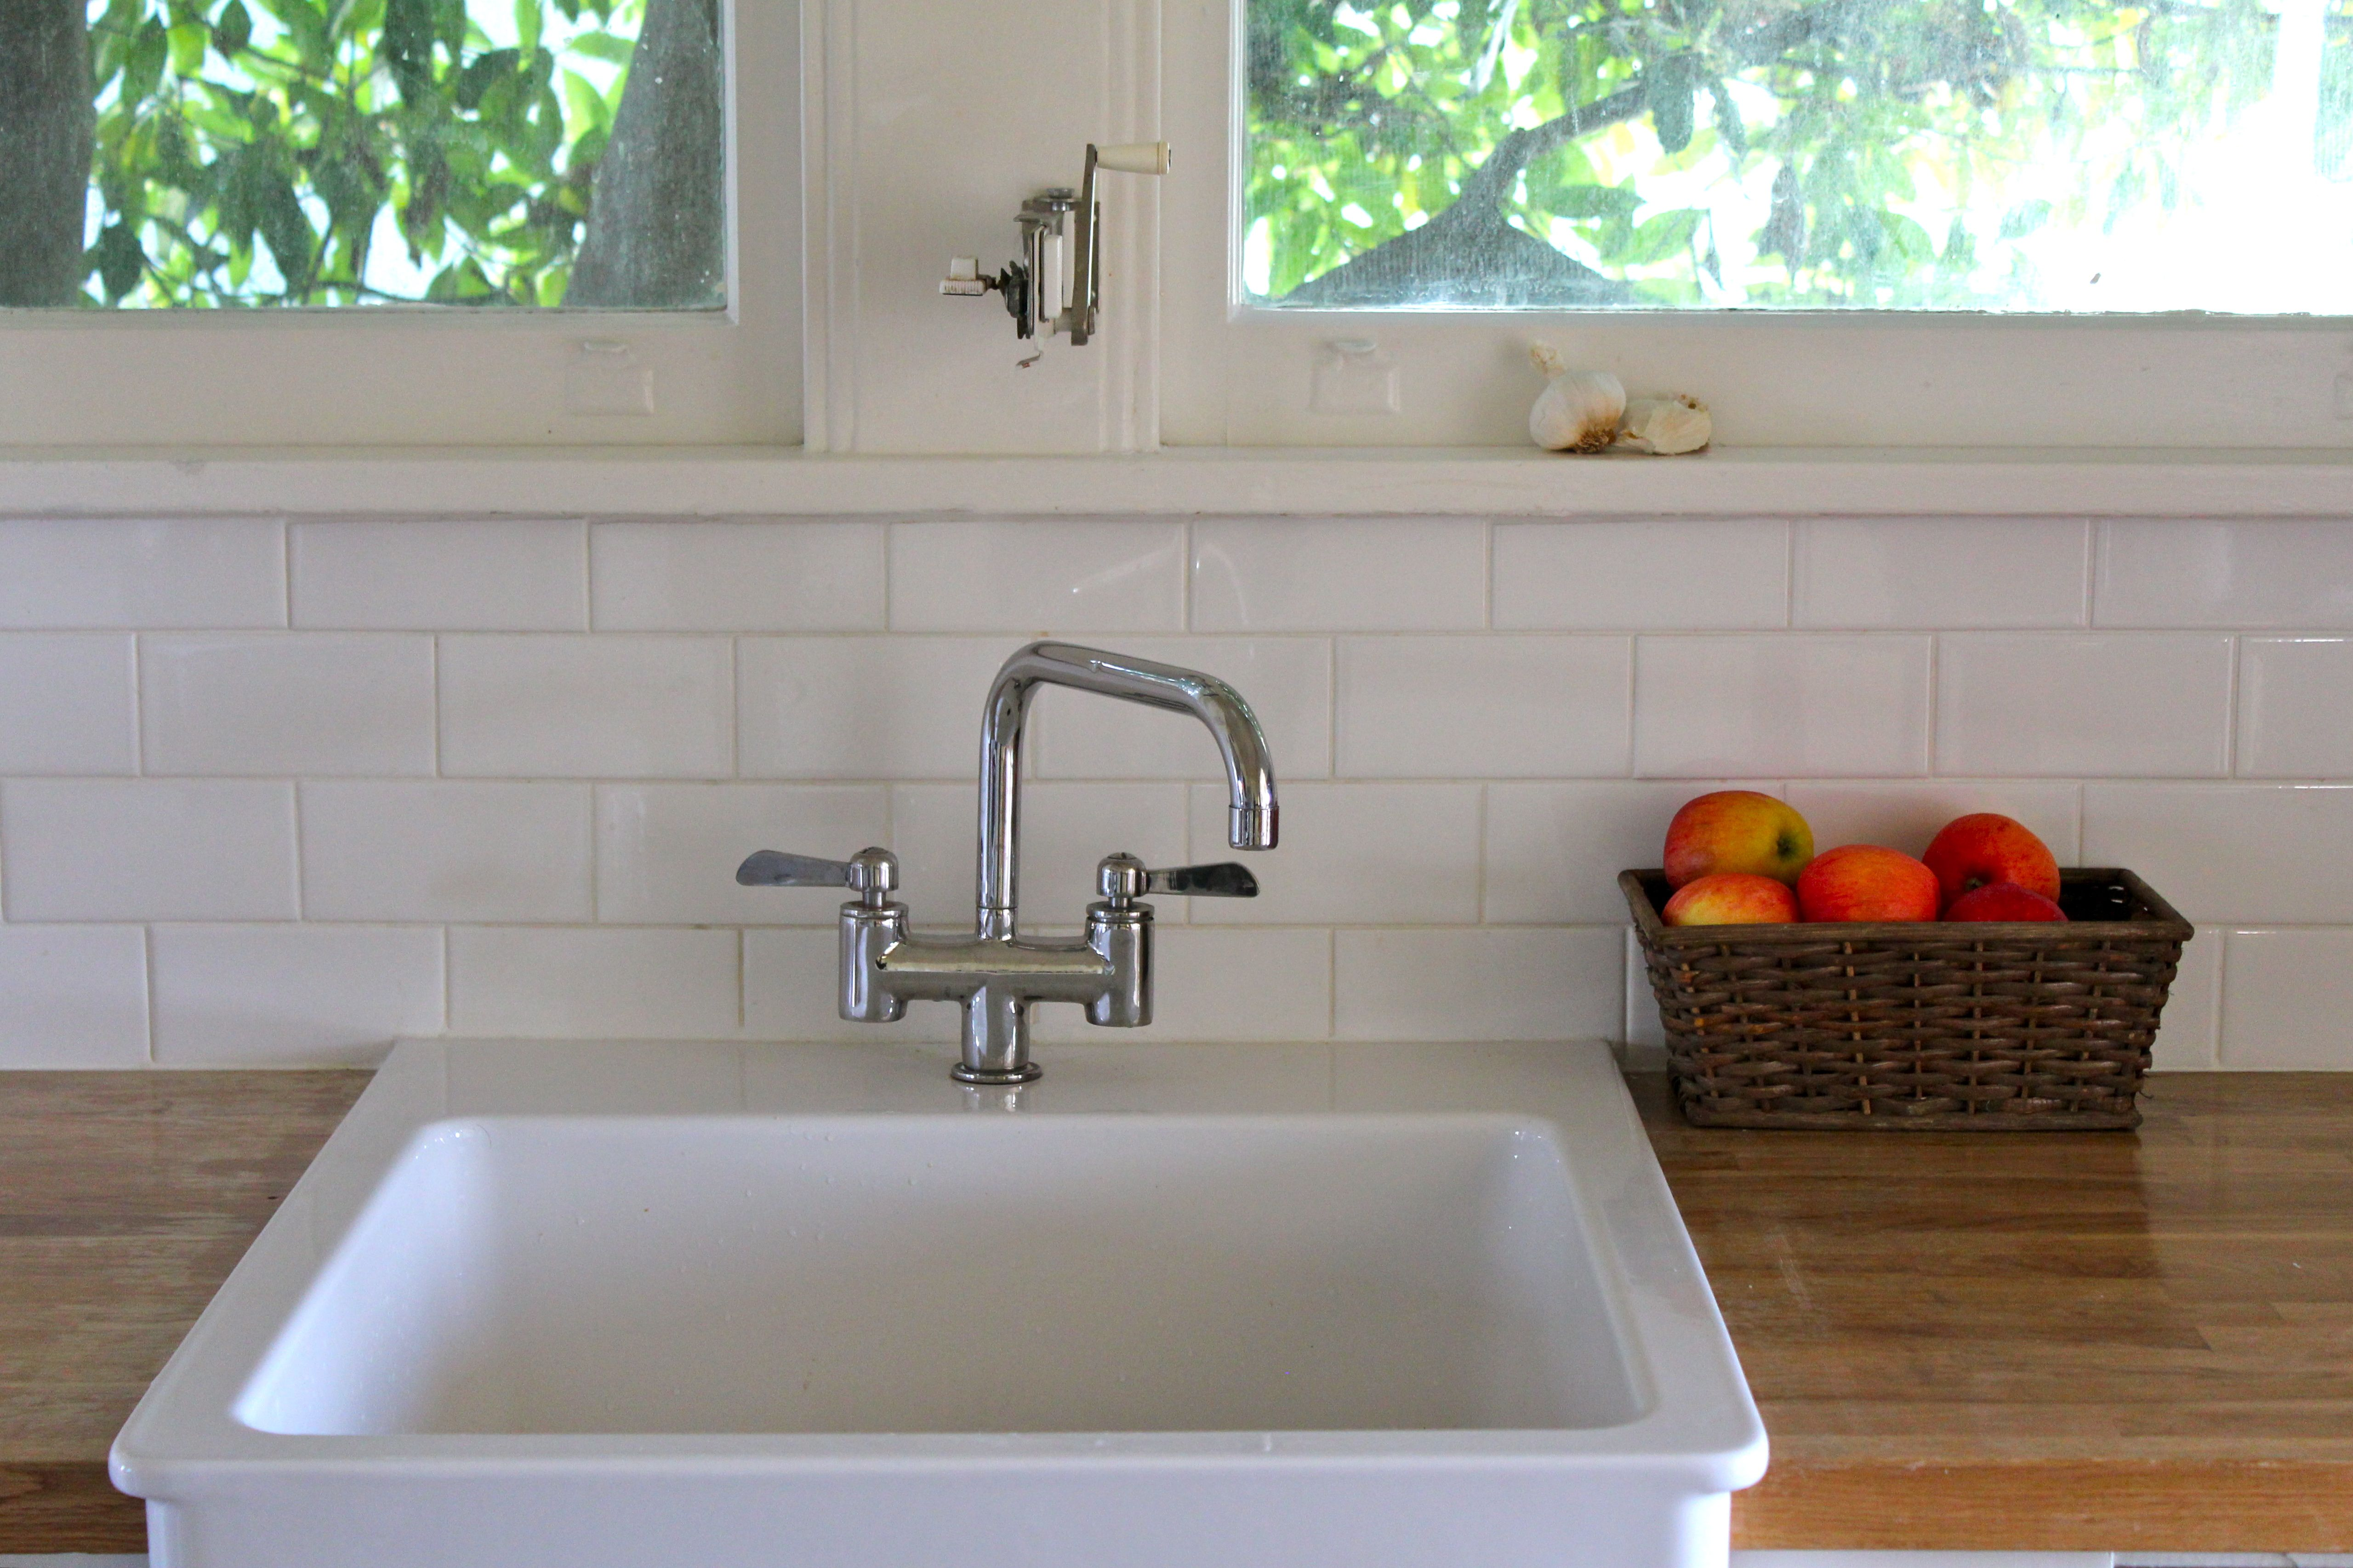 Subway Tile Backsplash Butcher S Block Counter And A Front Sink Le Sigh